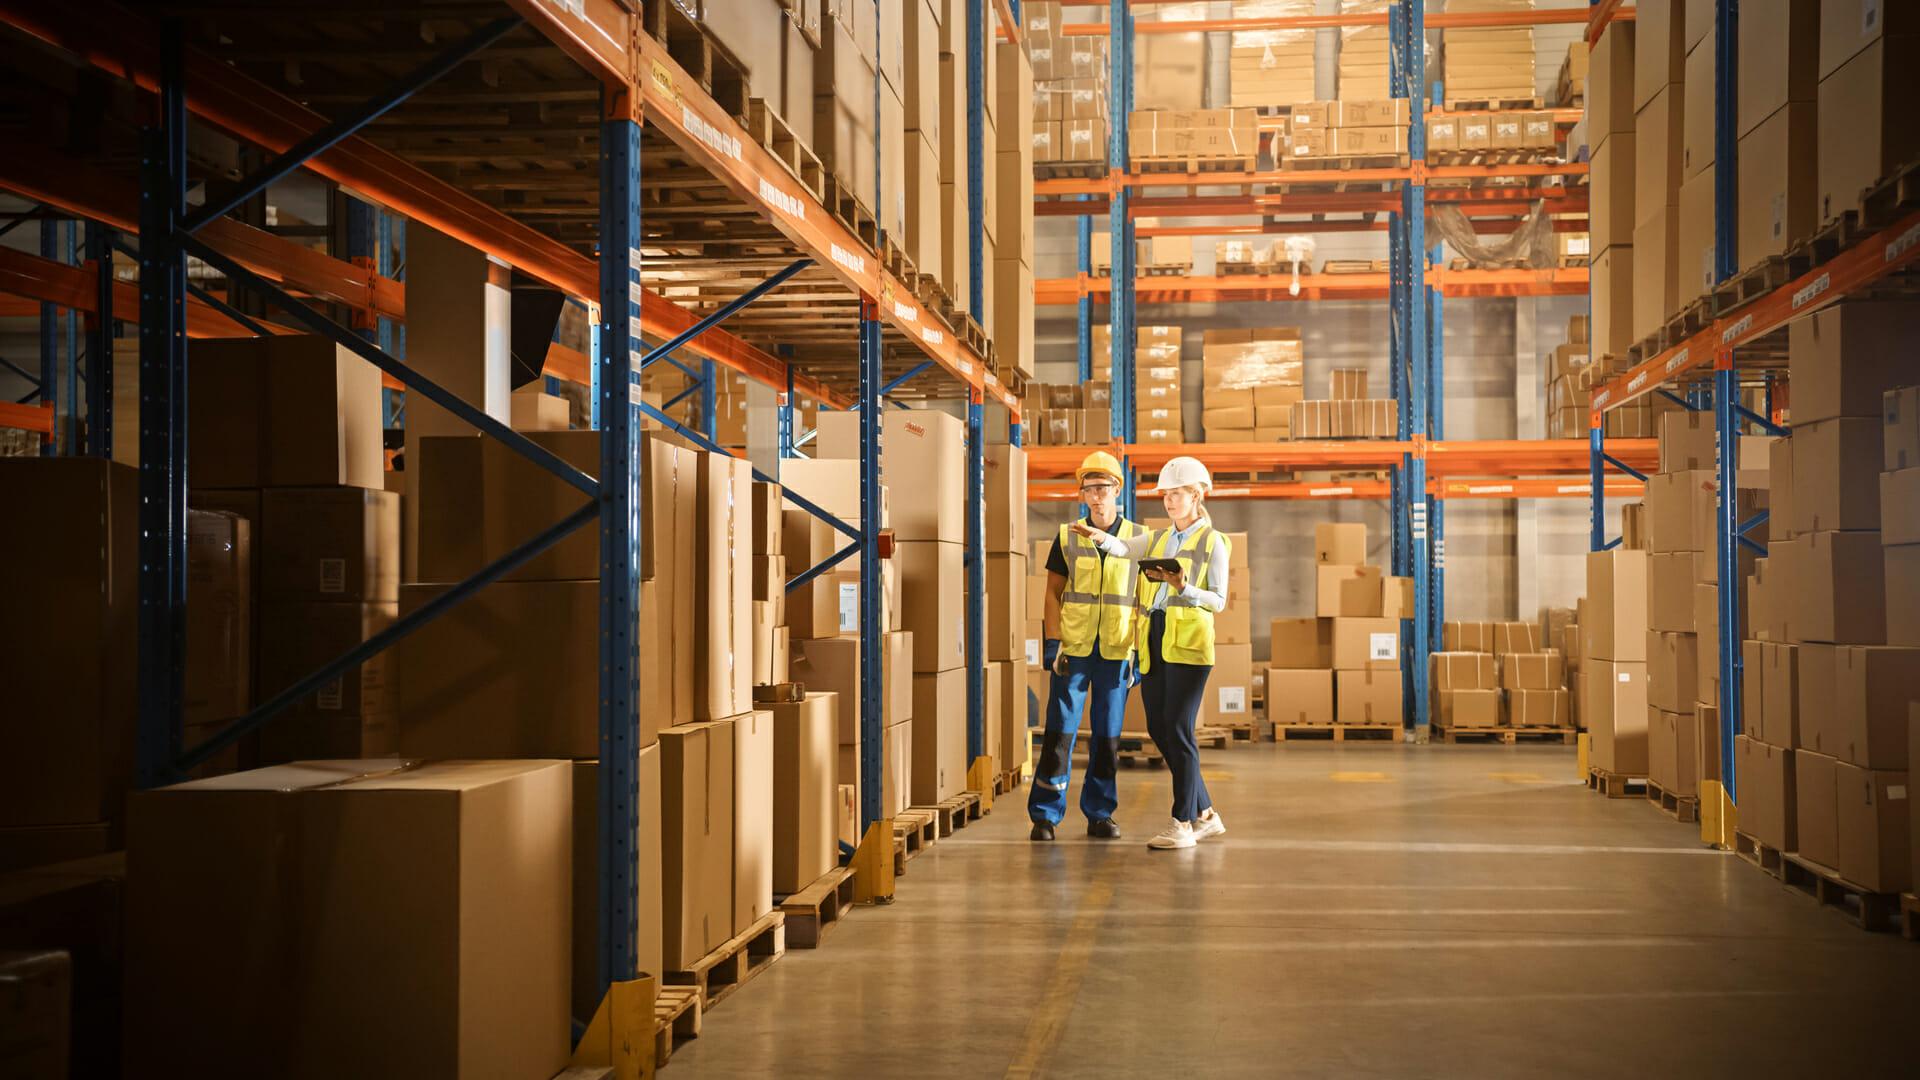 Optimize your warehouse management with the SAP EWM